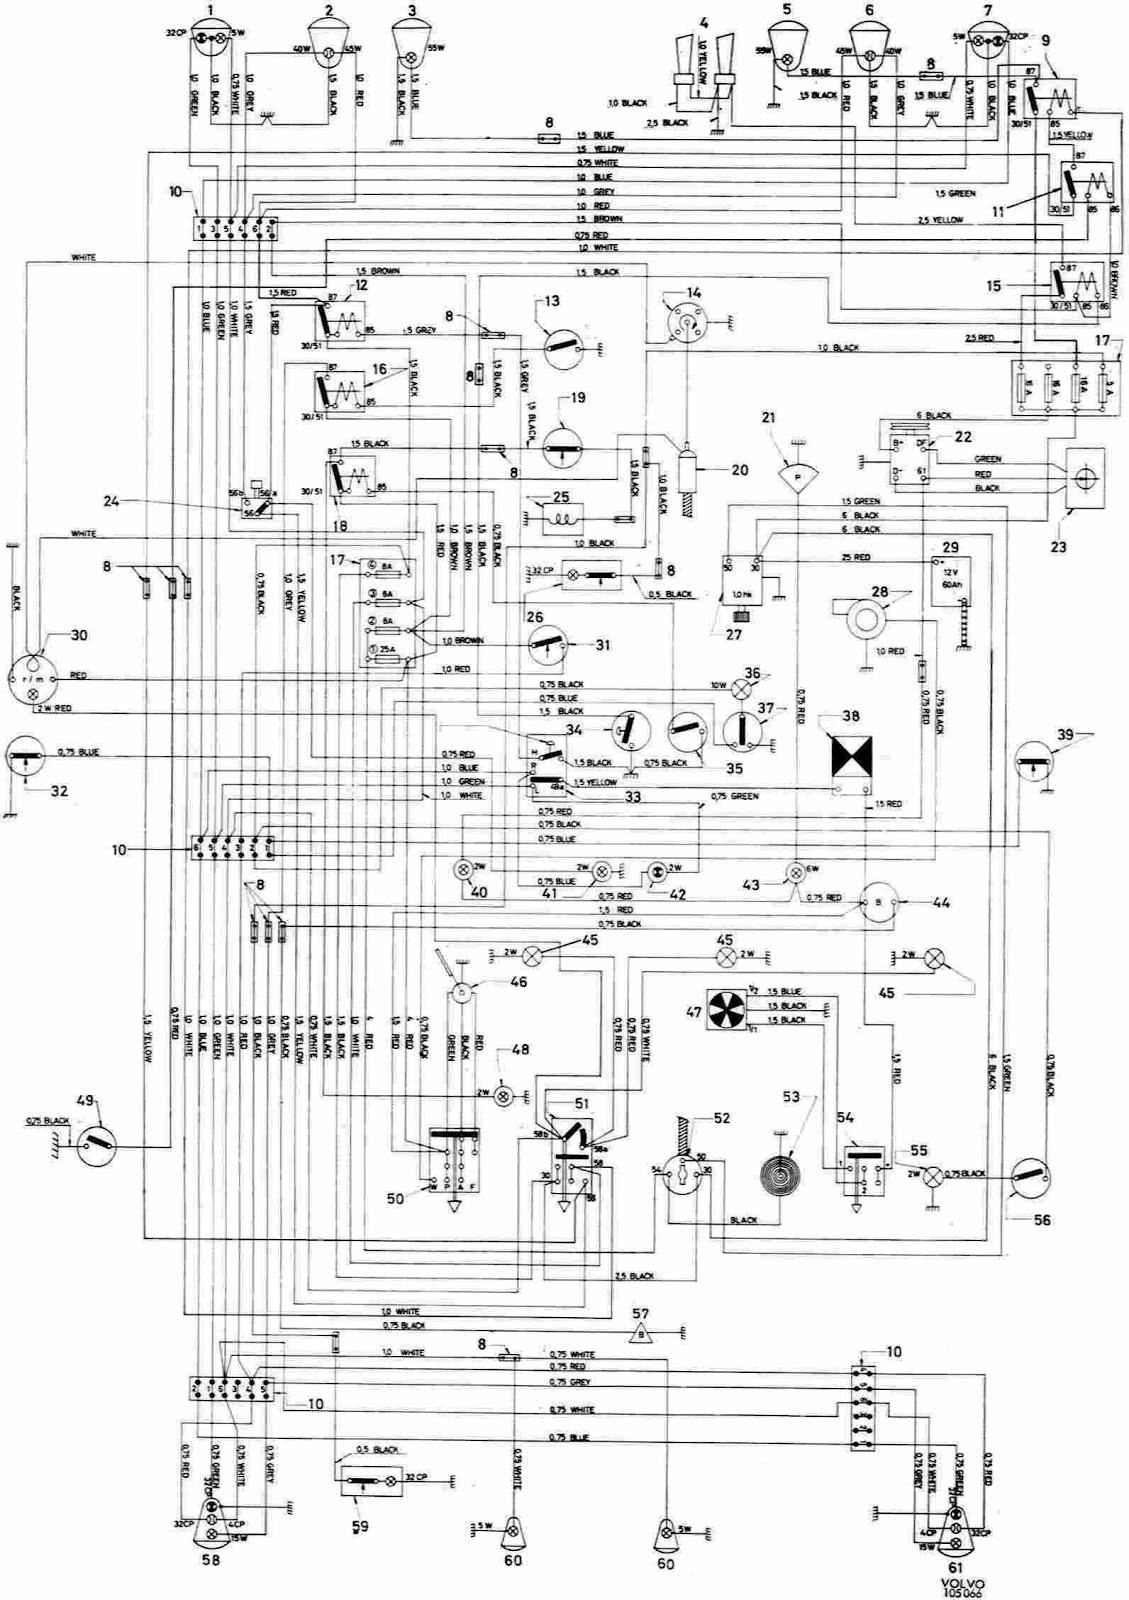 volvo wiring diagram xc70 2001 xc70 wiring diagram naning bali tintenglueck de volvo xc70 2006 wiring diagram 2001 xc70 wiring diagram naning bali